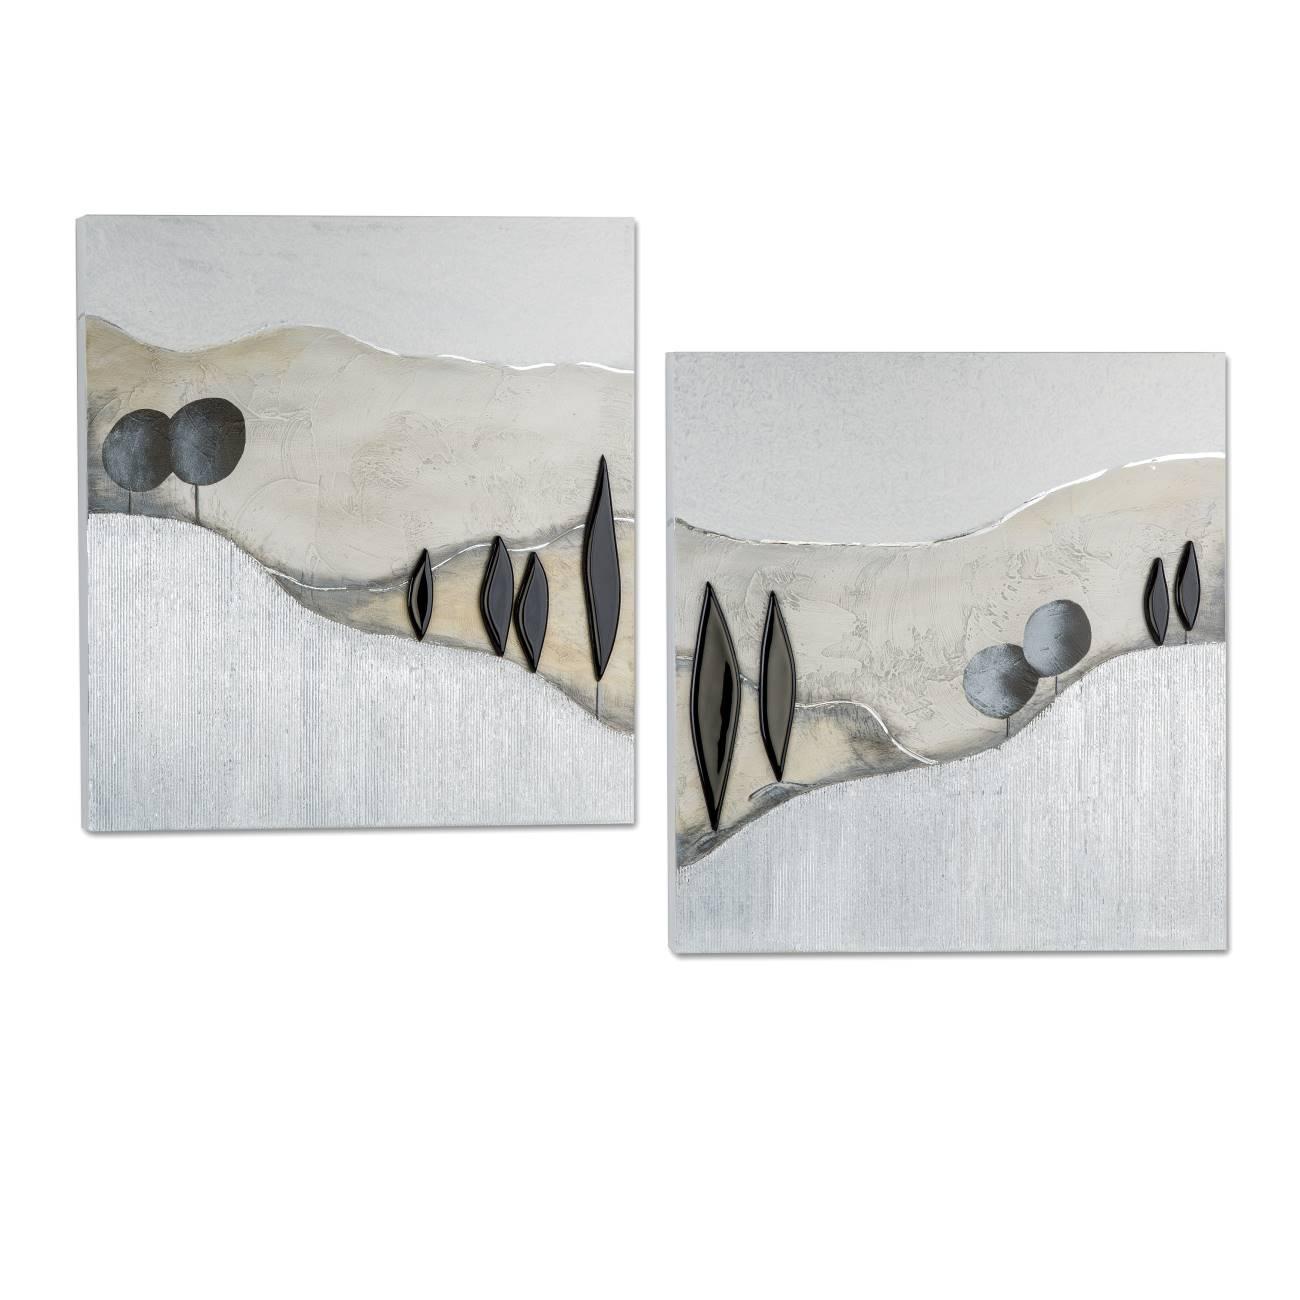 2er set wandbilder wanddeko landschaft je 60x60cm schwarz grau silber formano ebay. Black Bedroom Furniture Sets. Home Design Ideas